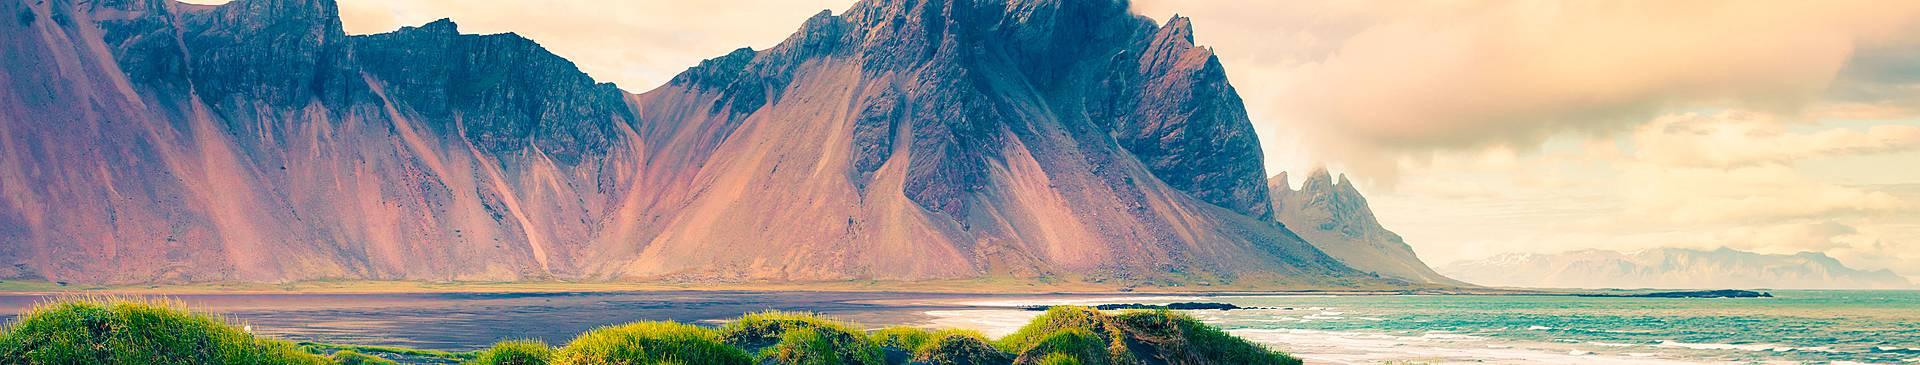 Iceland nature tours